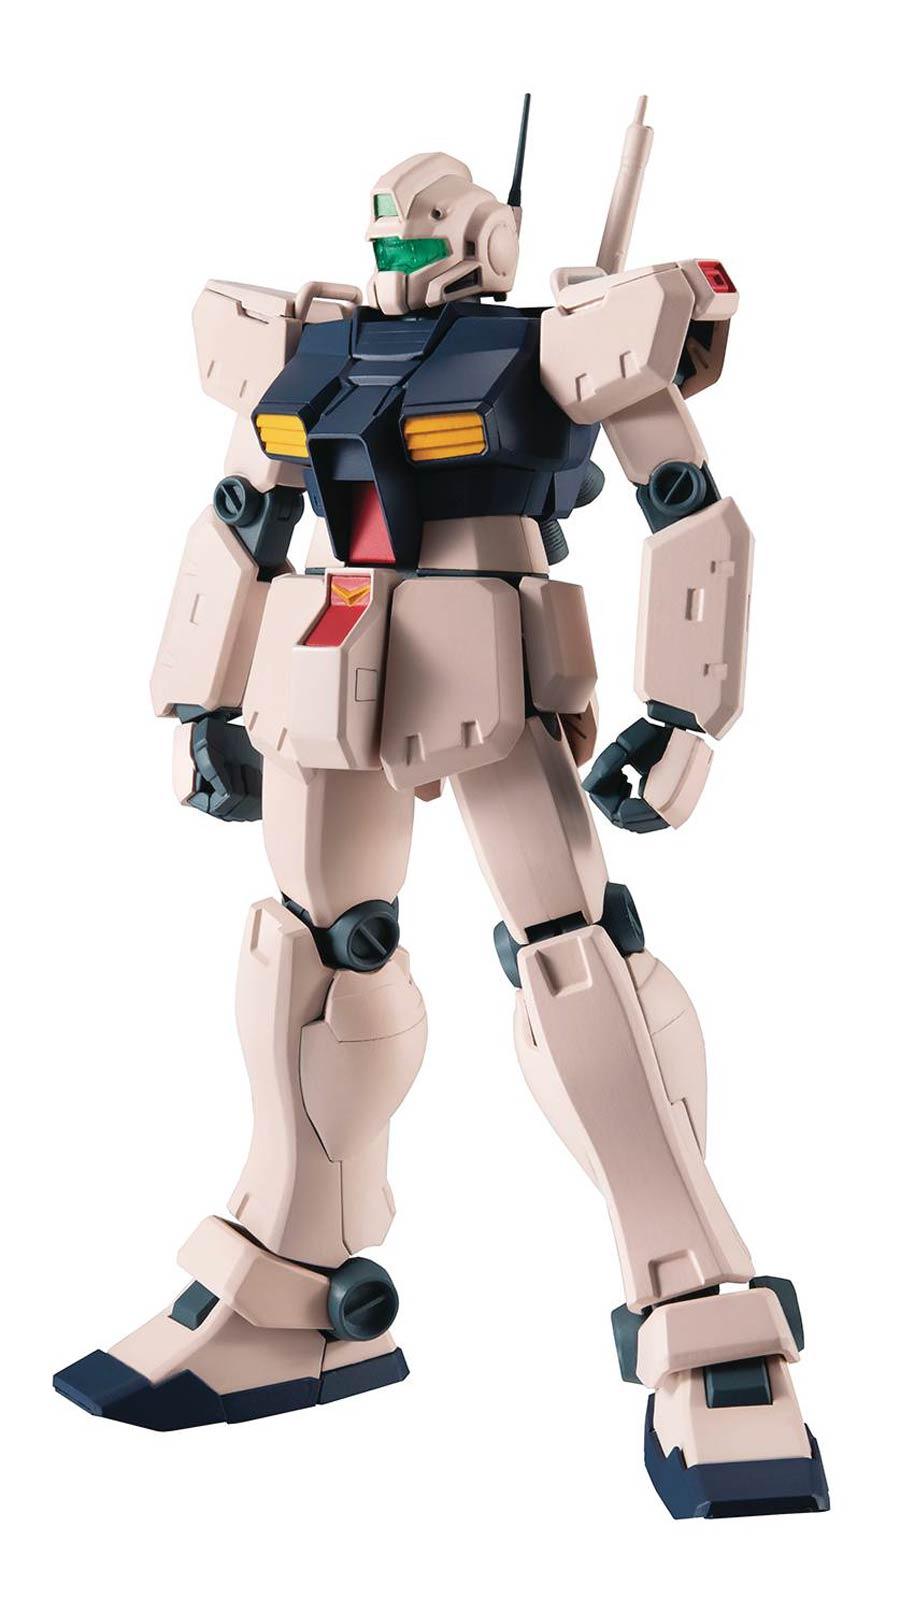 Robot Spirits #260 (Side MS) RGM-79C GM Type-C Ver. A.N.I.M.E. Action Figure